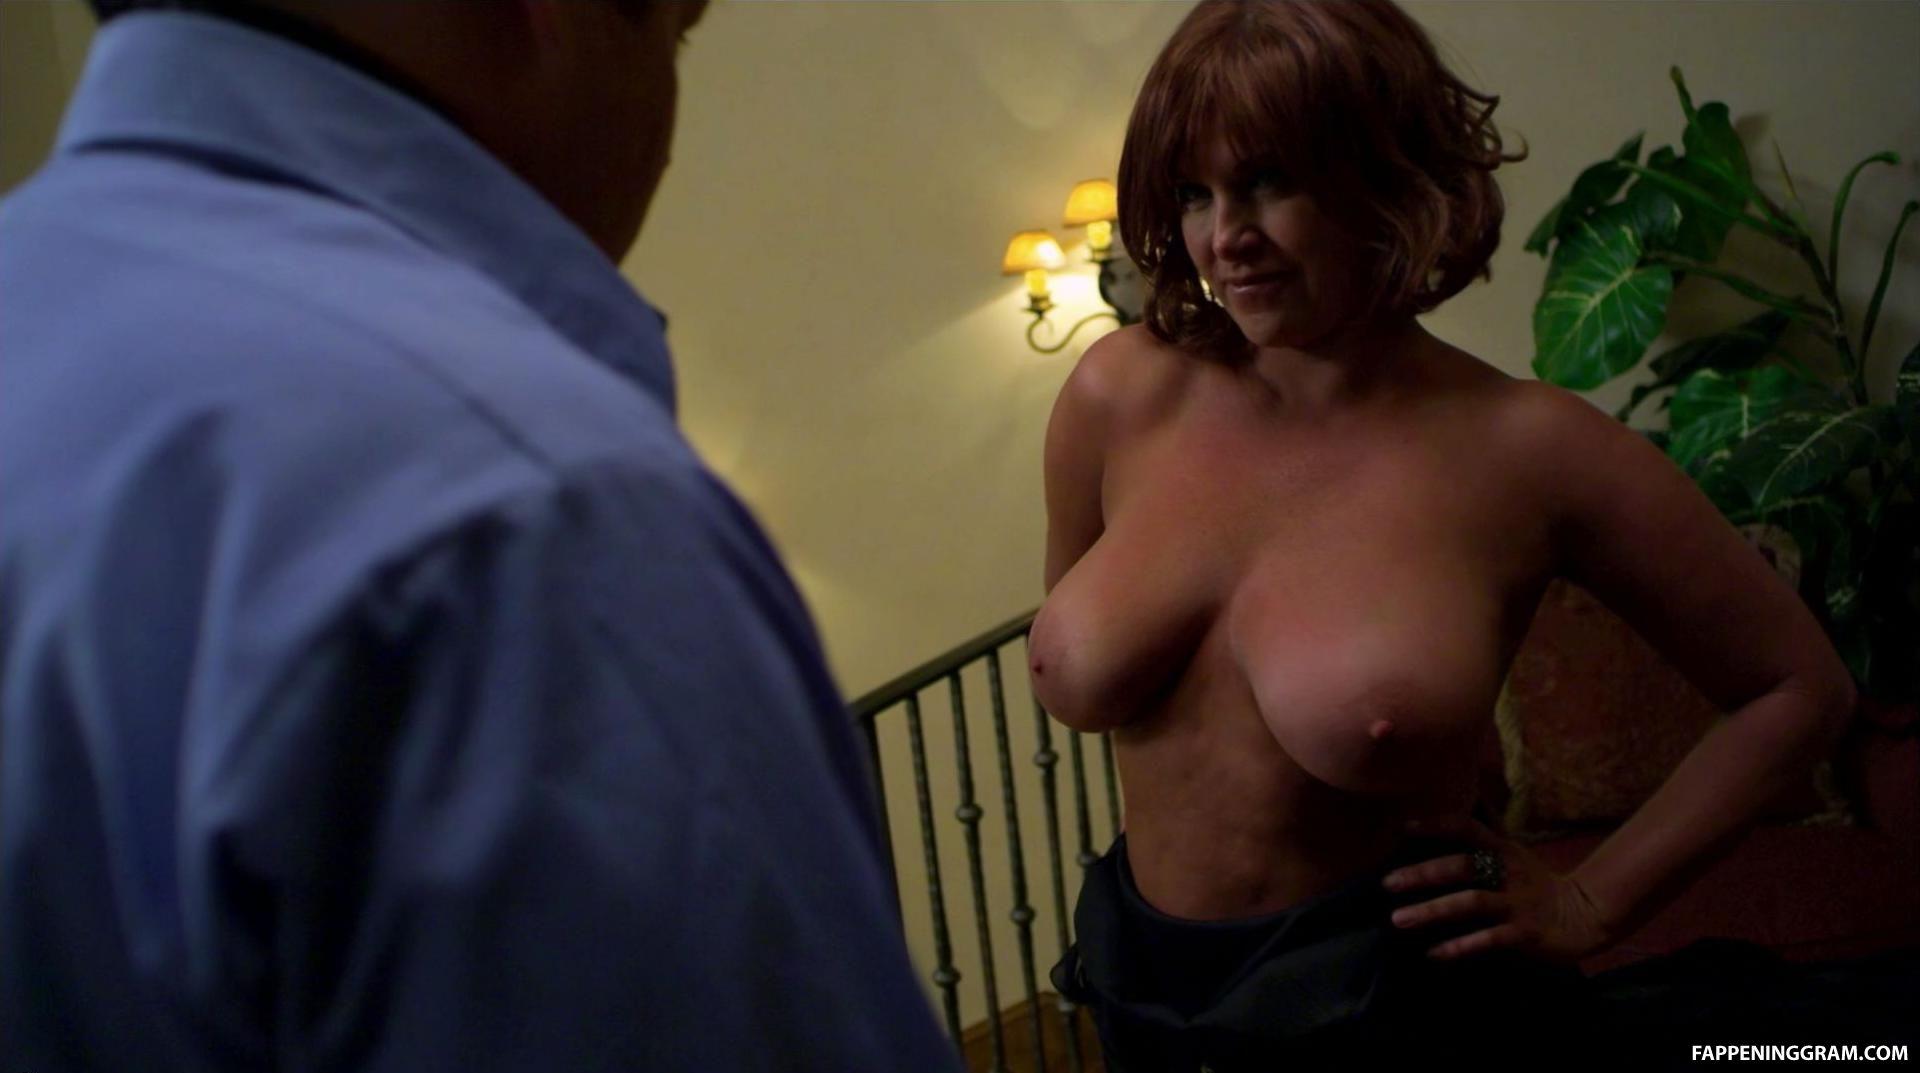 Helen hunt nude, topless pictures, playboy photos, sex scene uncensored